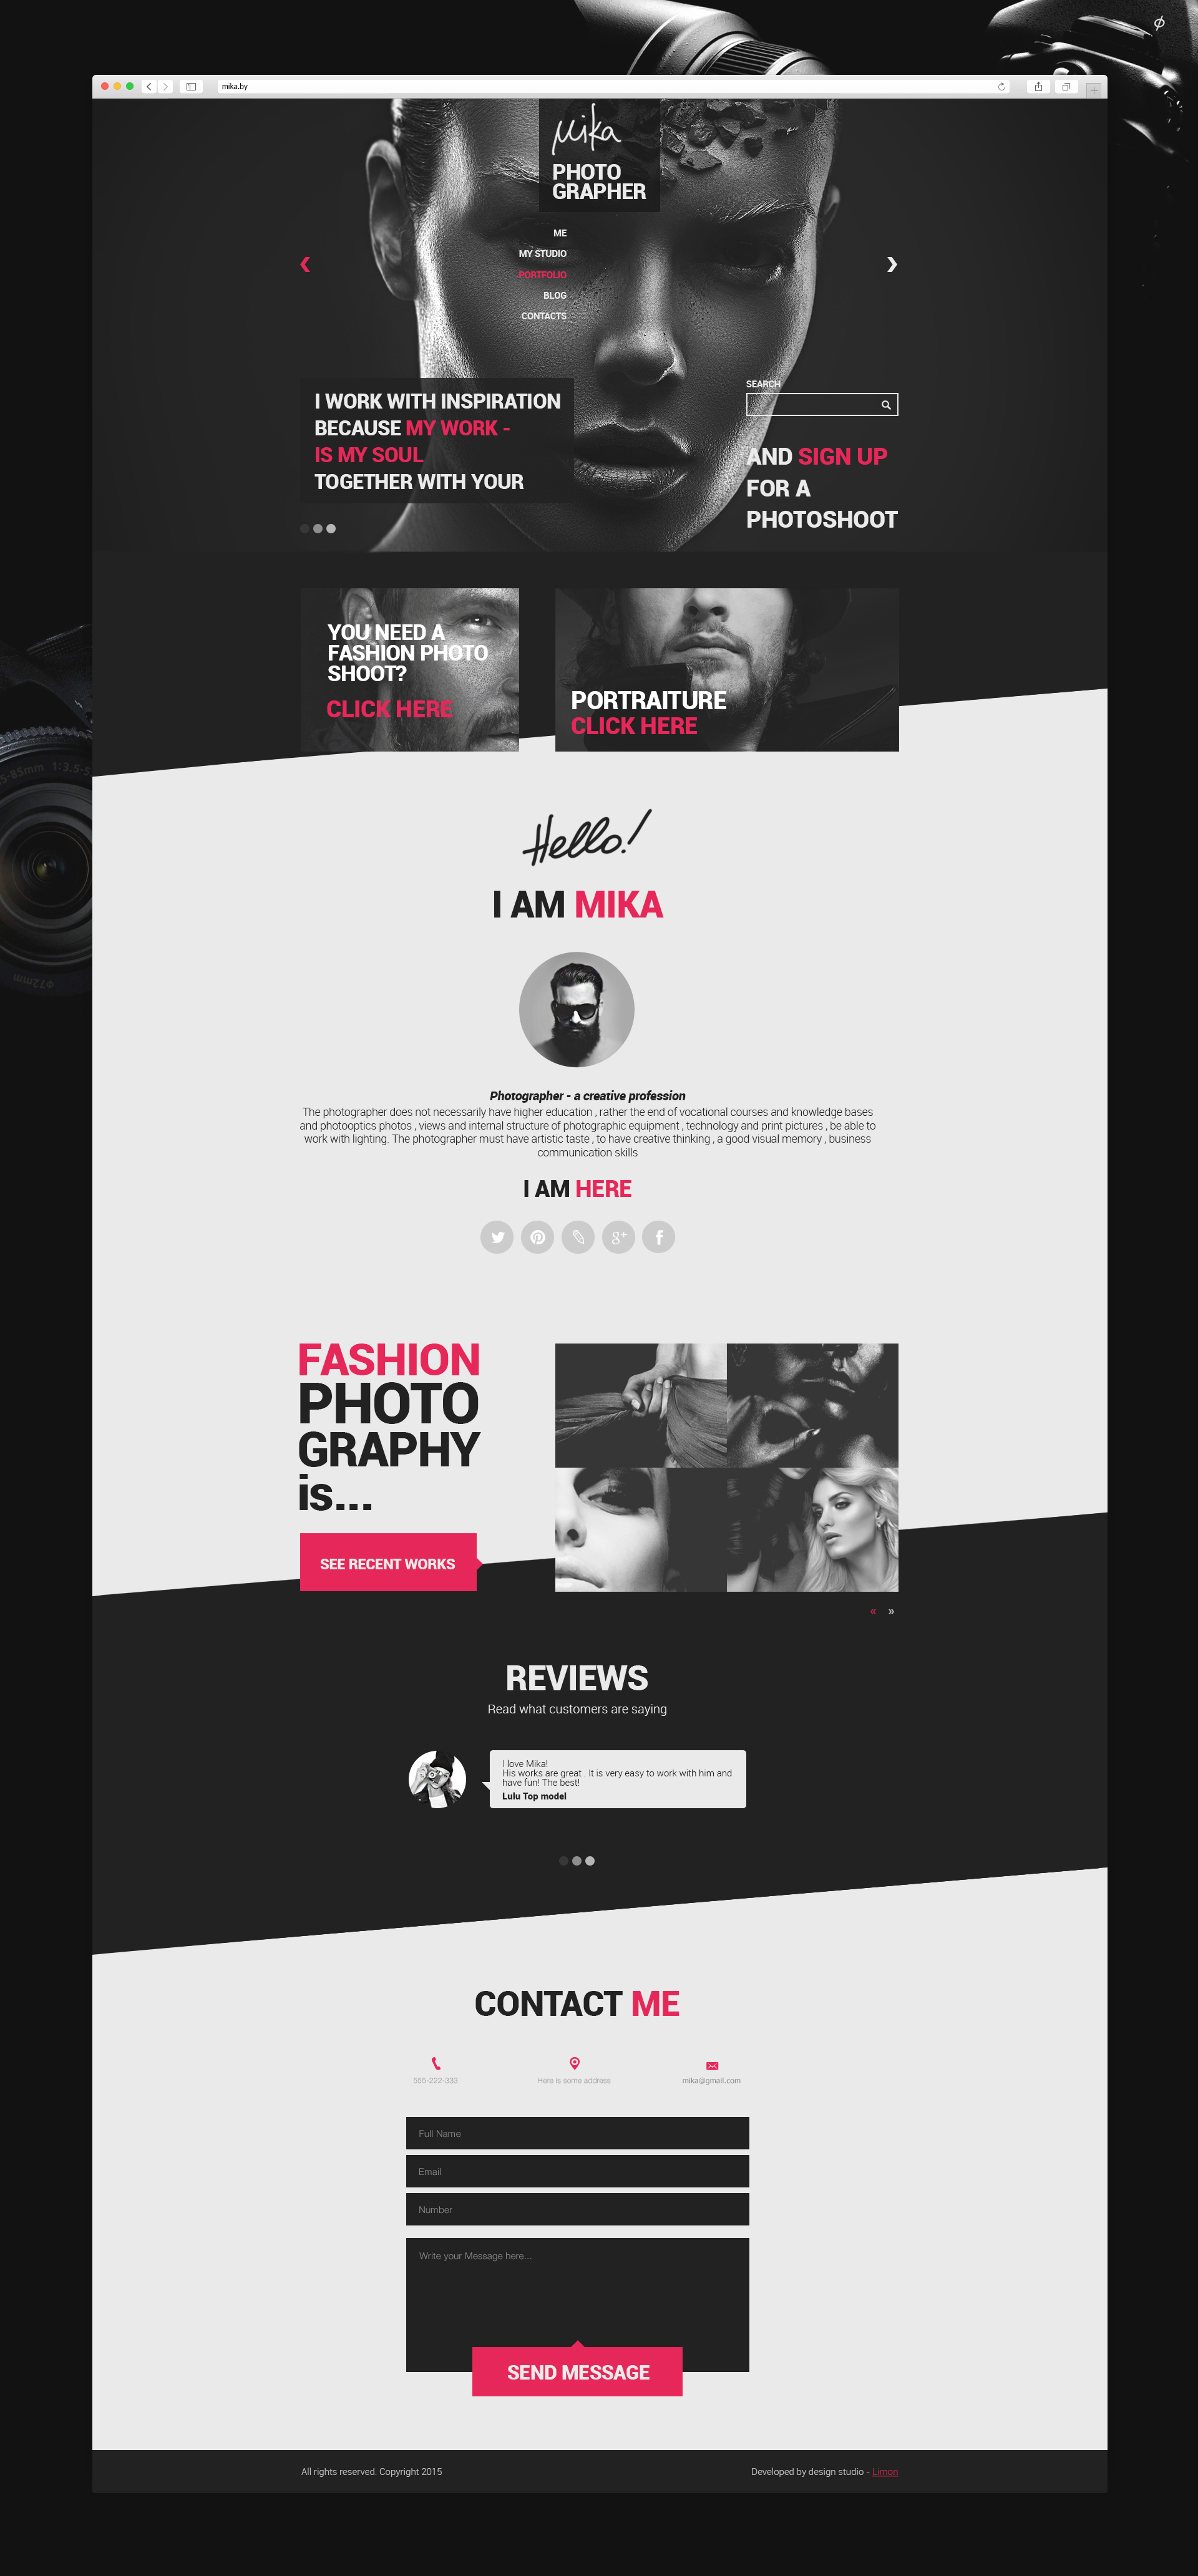 Дизайн сайта фотографа Mika